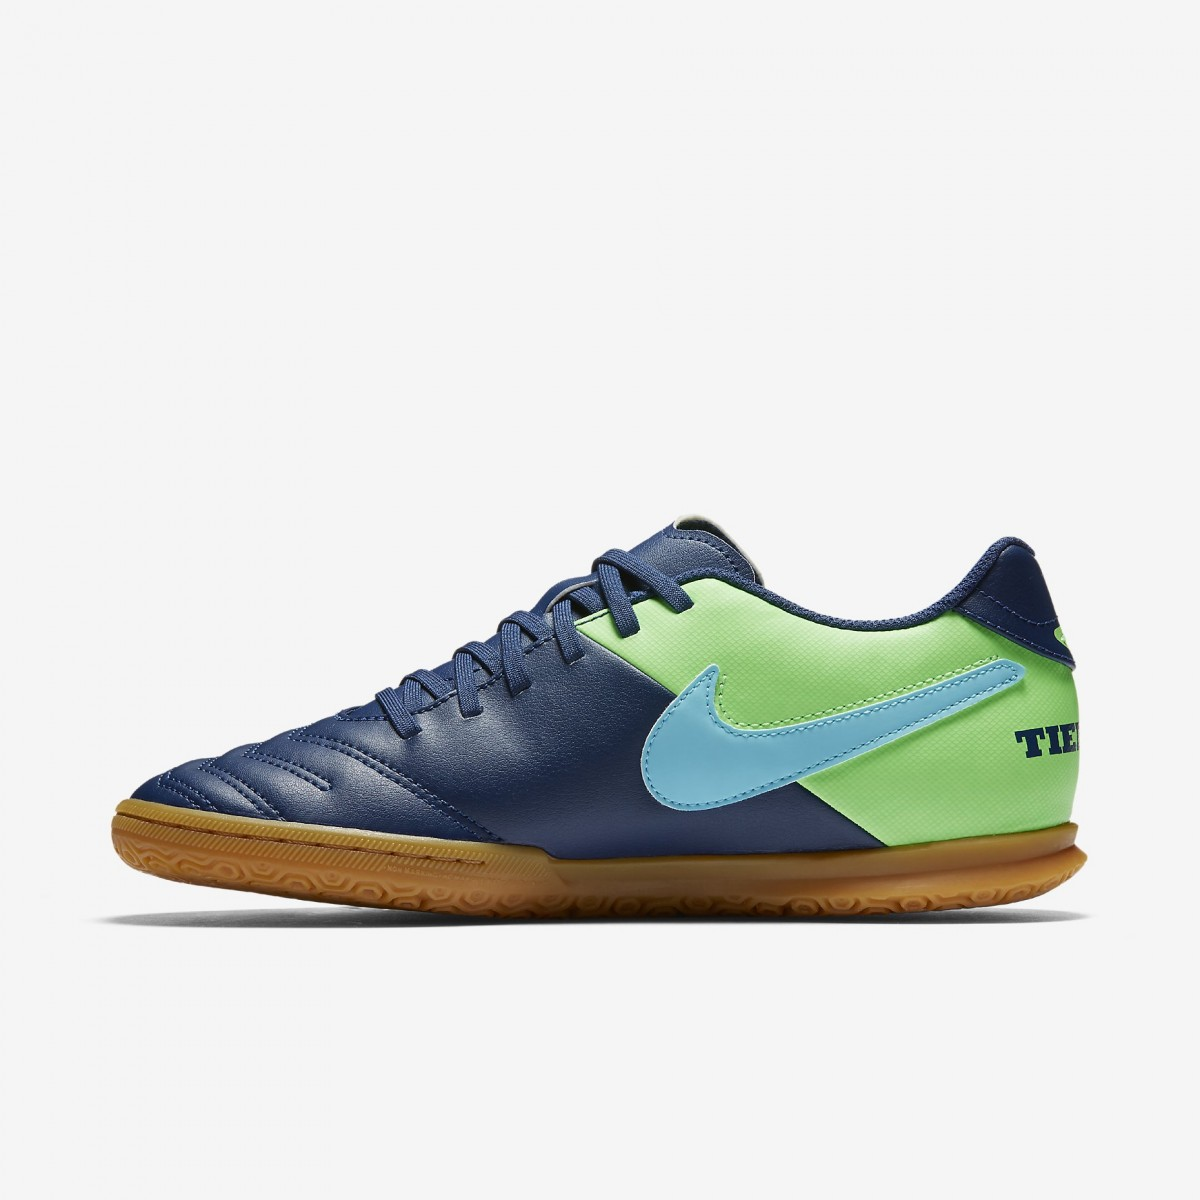 2786cc5df75bd Bizz Store - Chuteira Futsal Nike Tiempo Rio III IC Masculina